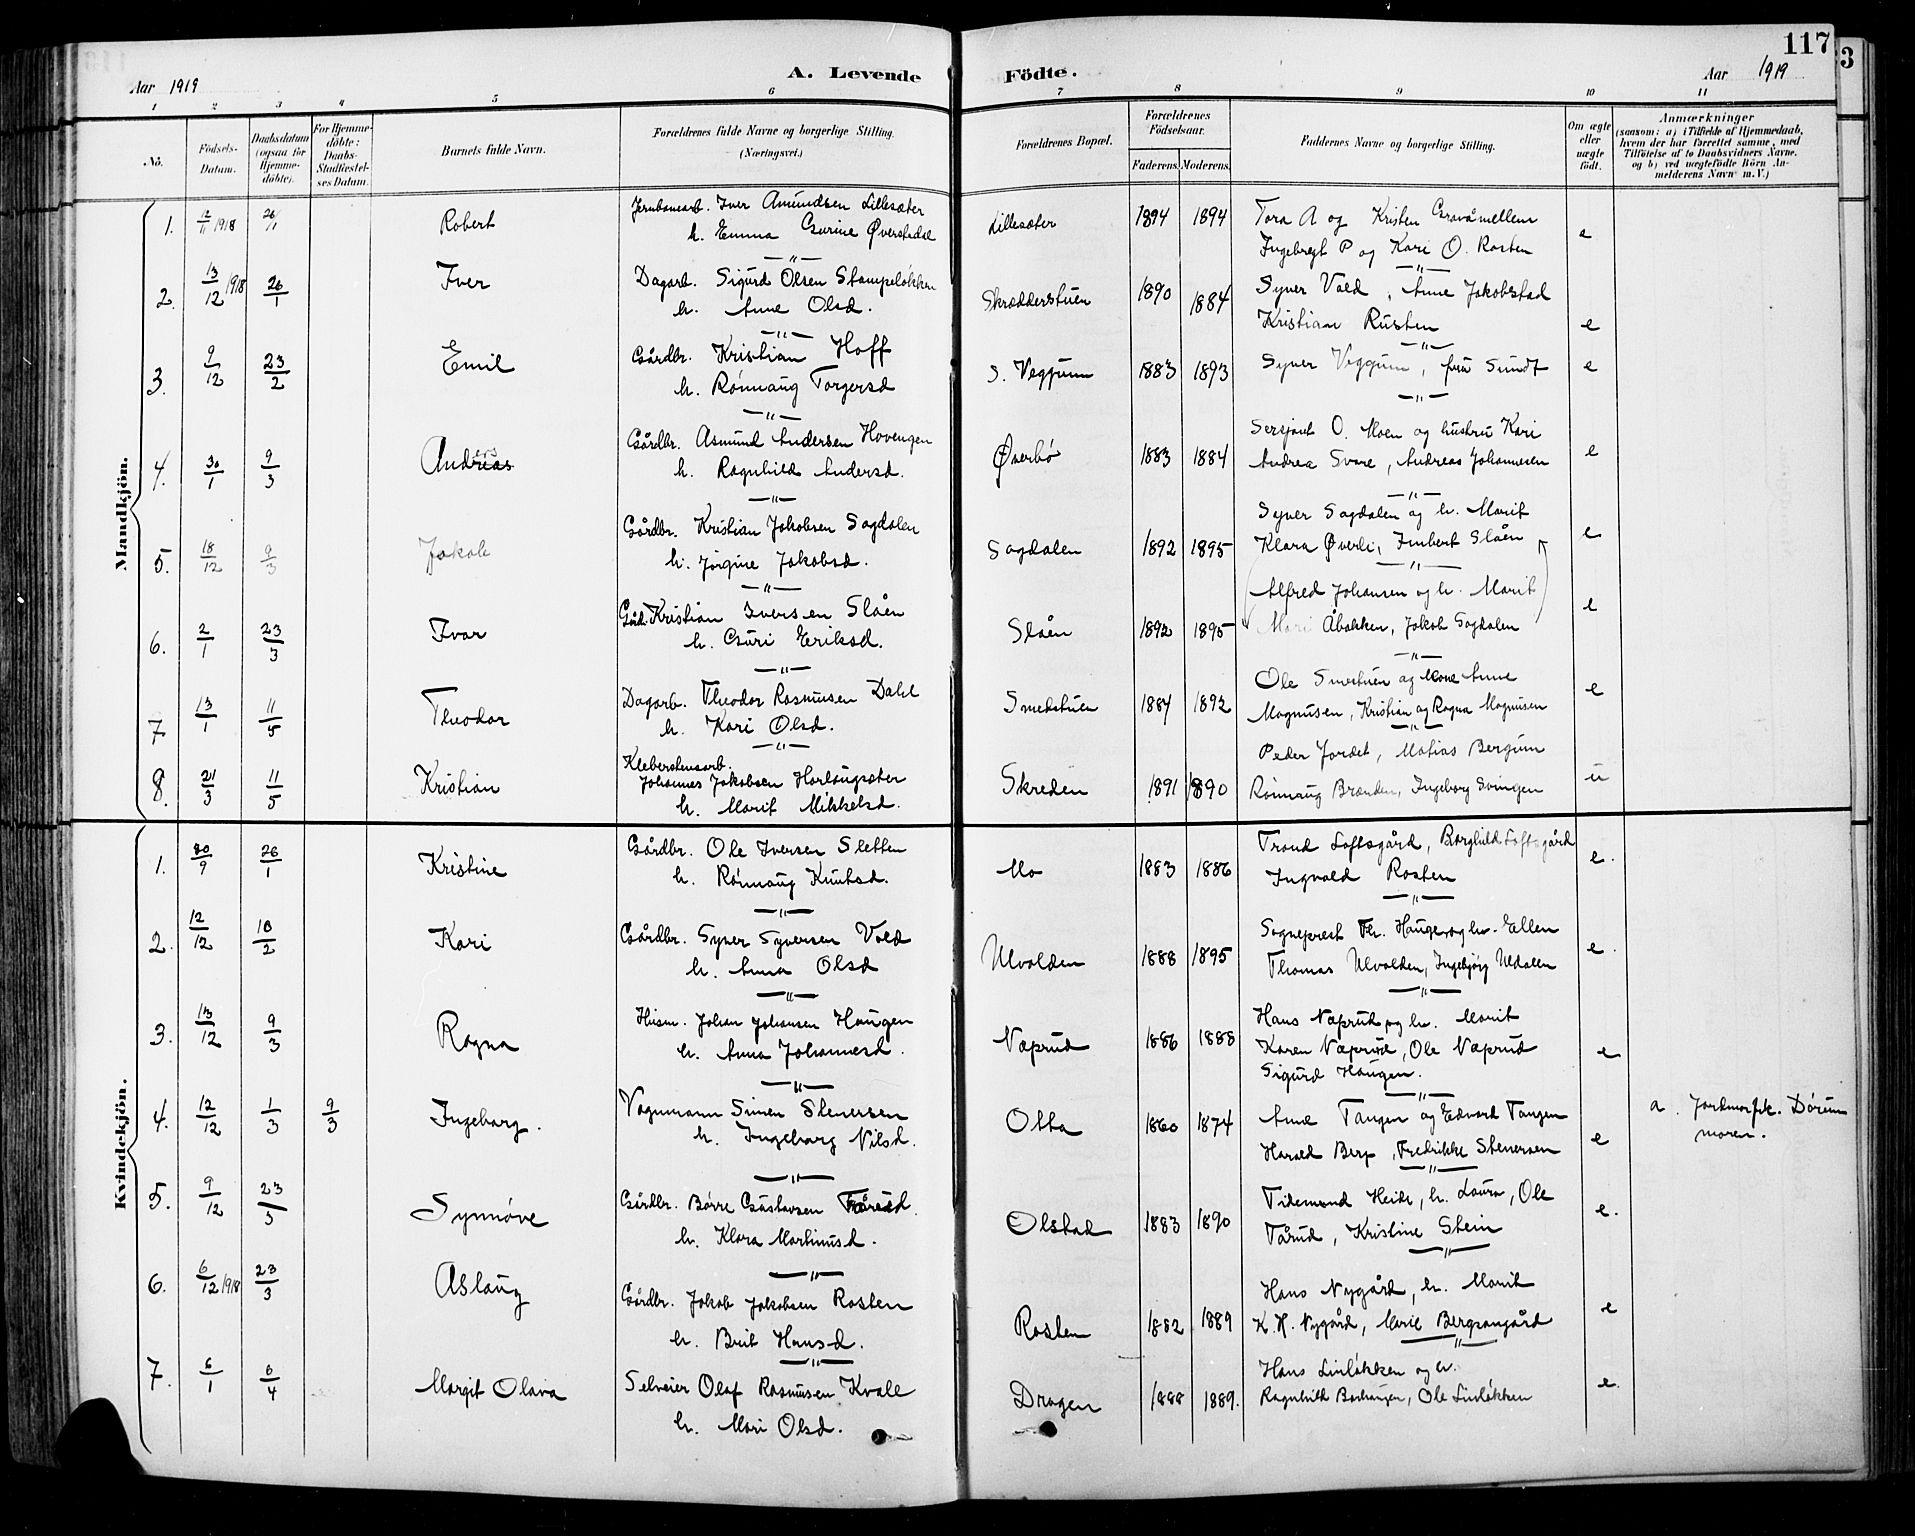 SAH, Sel prestekontor, Klokkerbok nr. 1, 1894-1923, s. 117